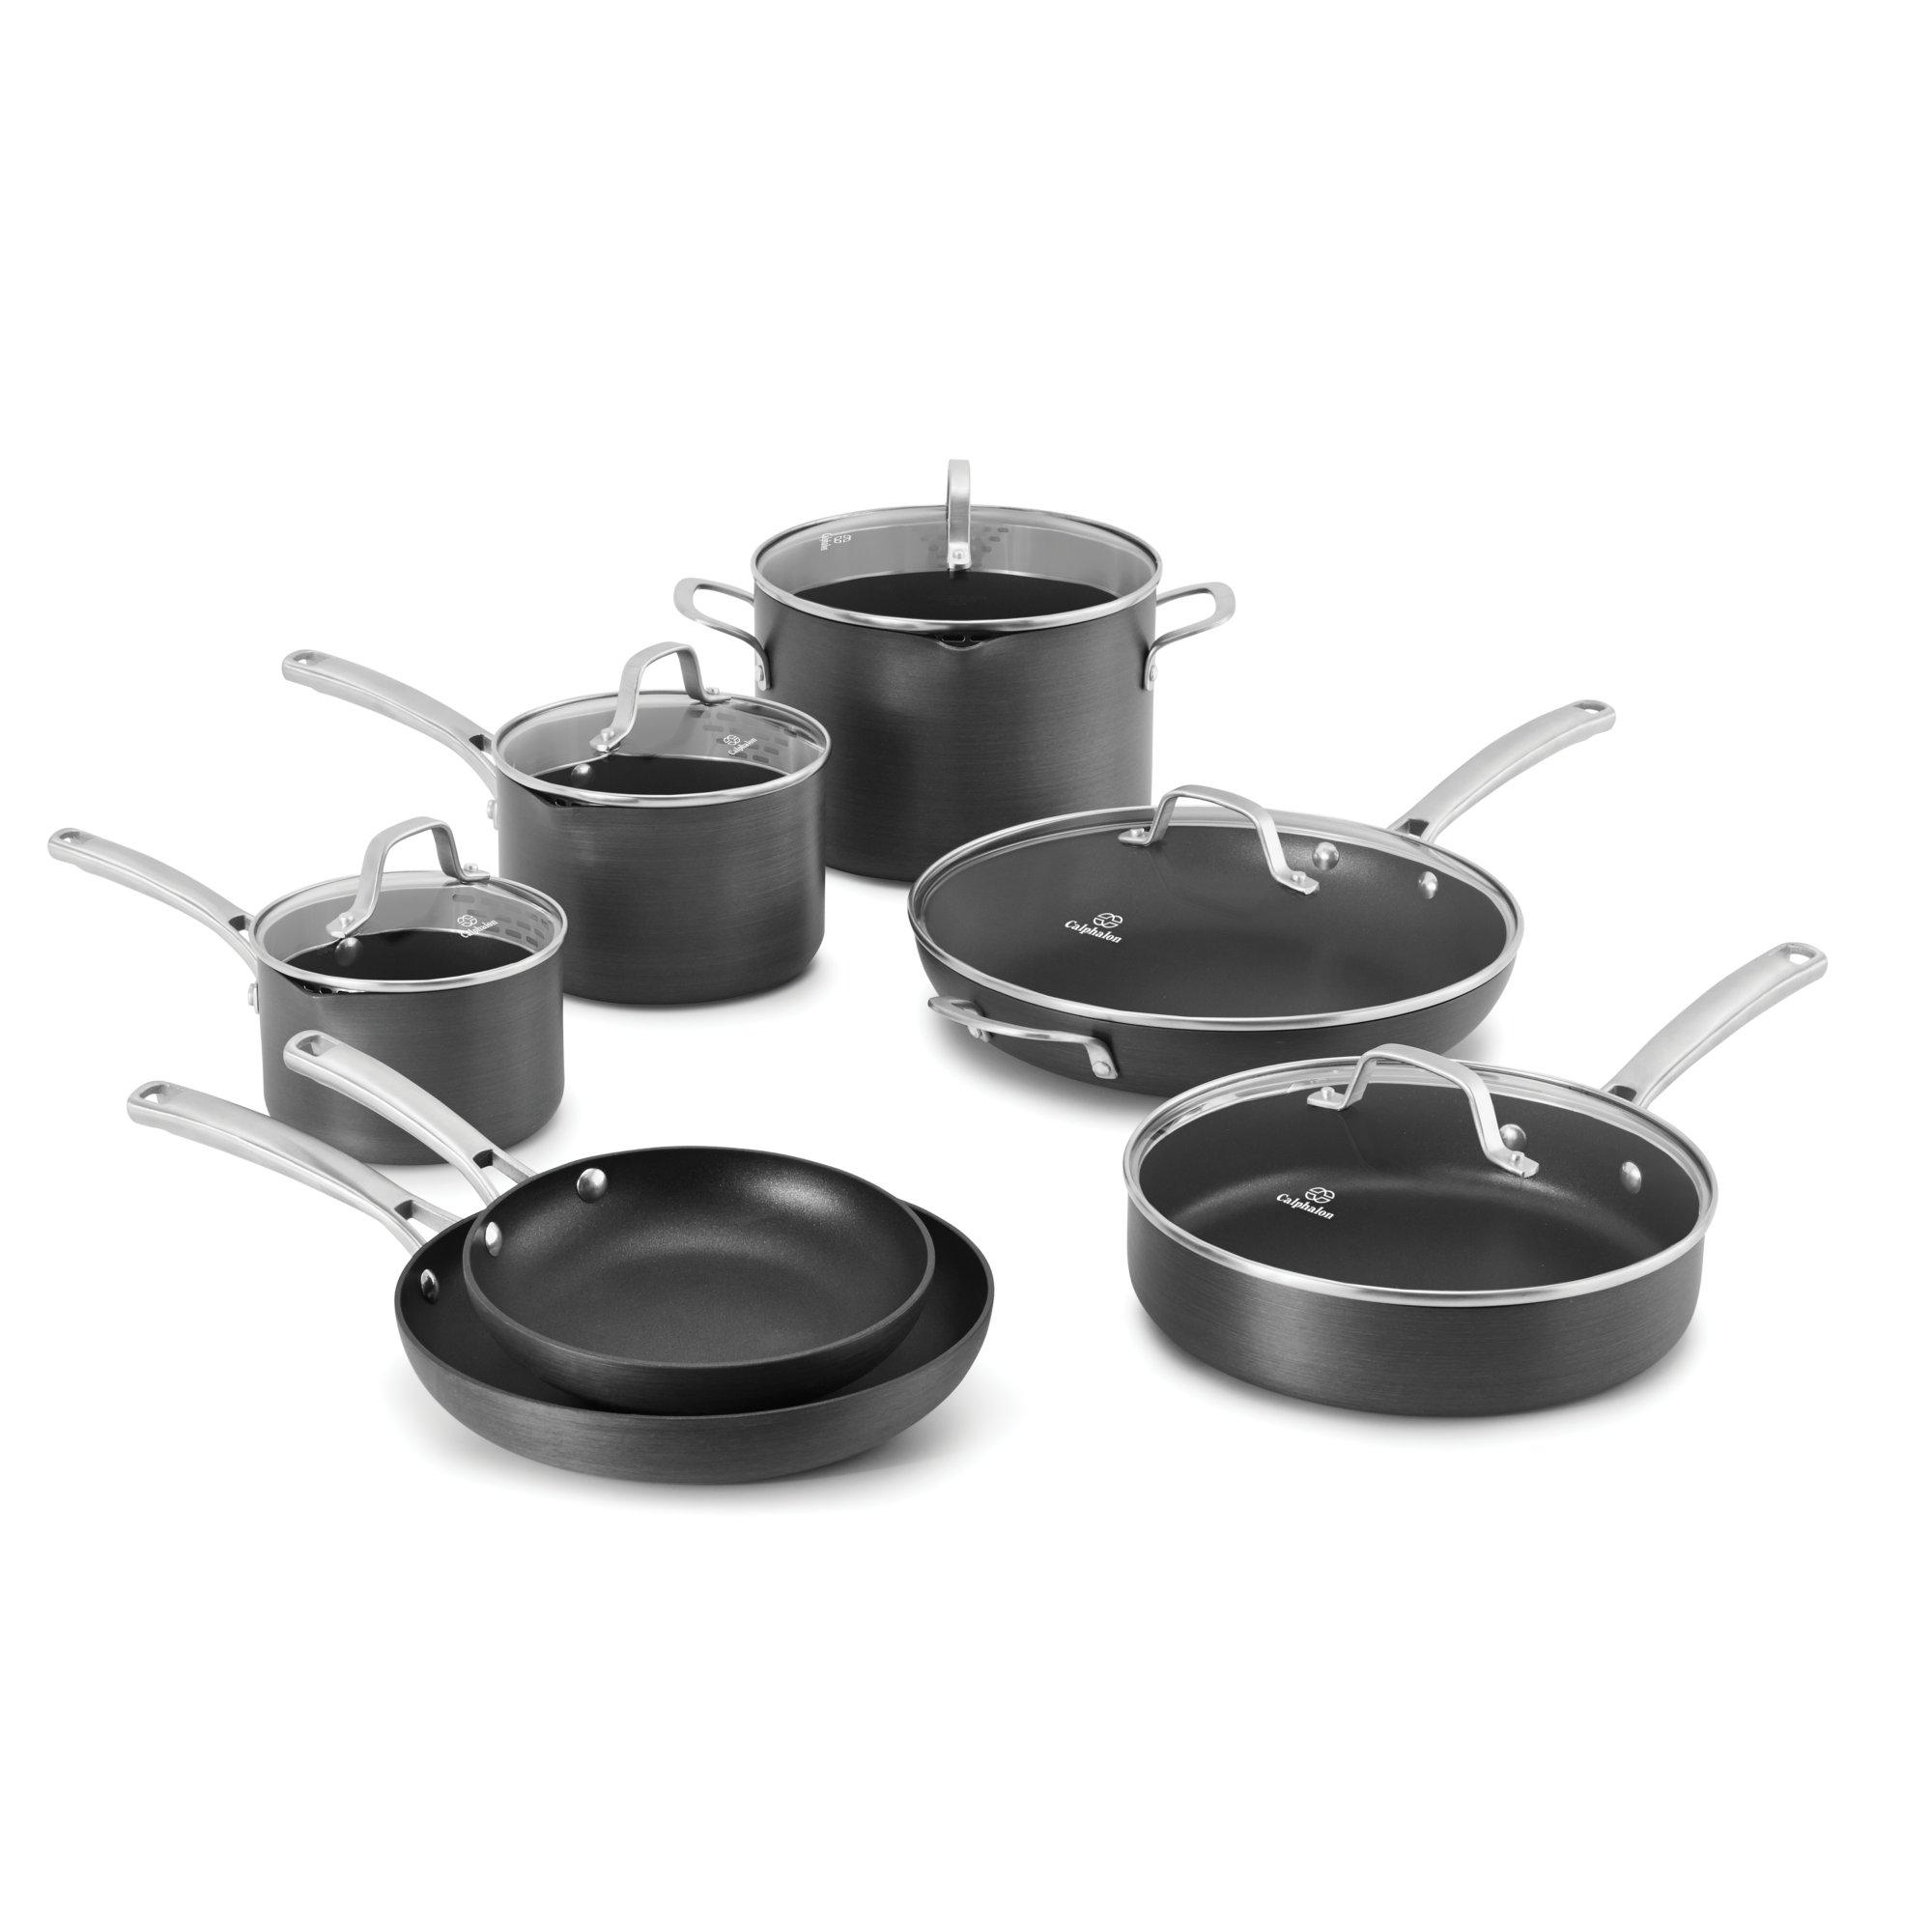 Calphalon Classic™ Nonstick 12-pc. Cookware Set ...